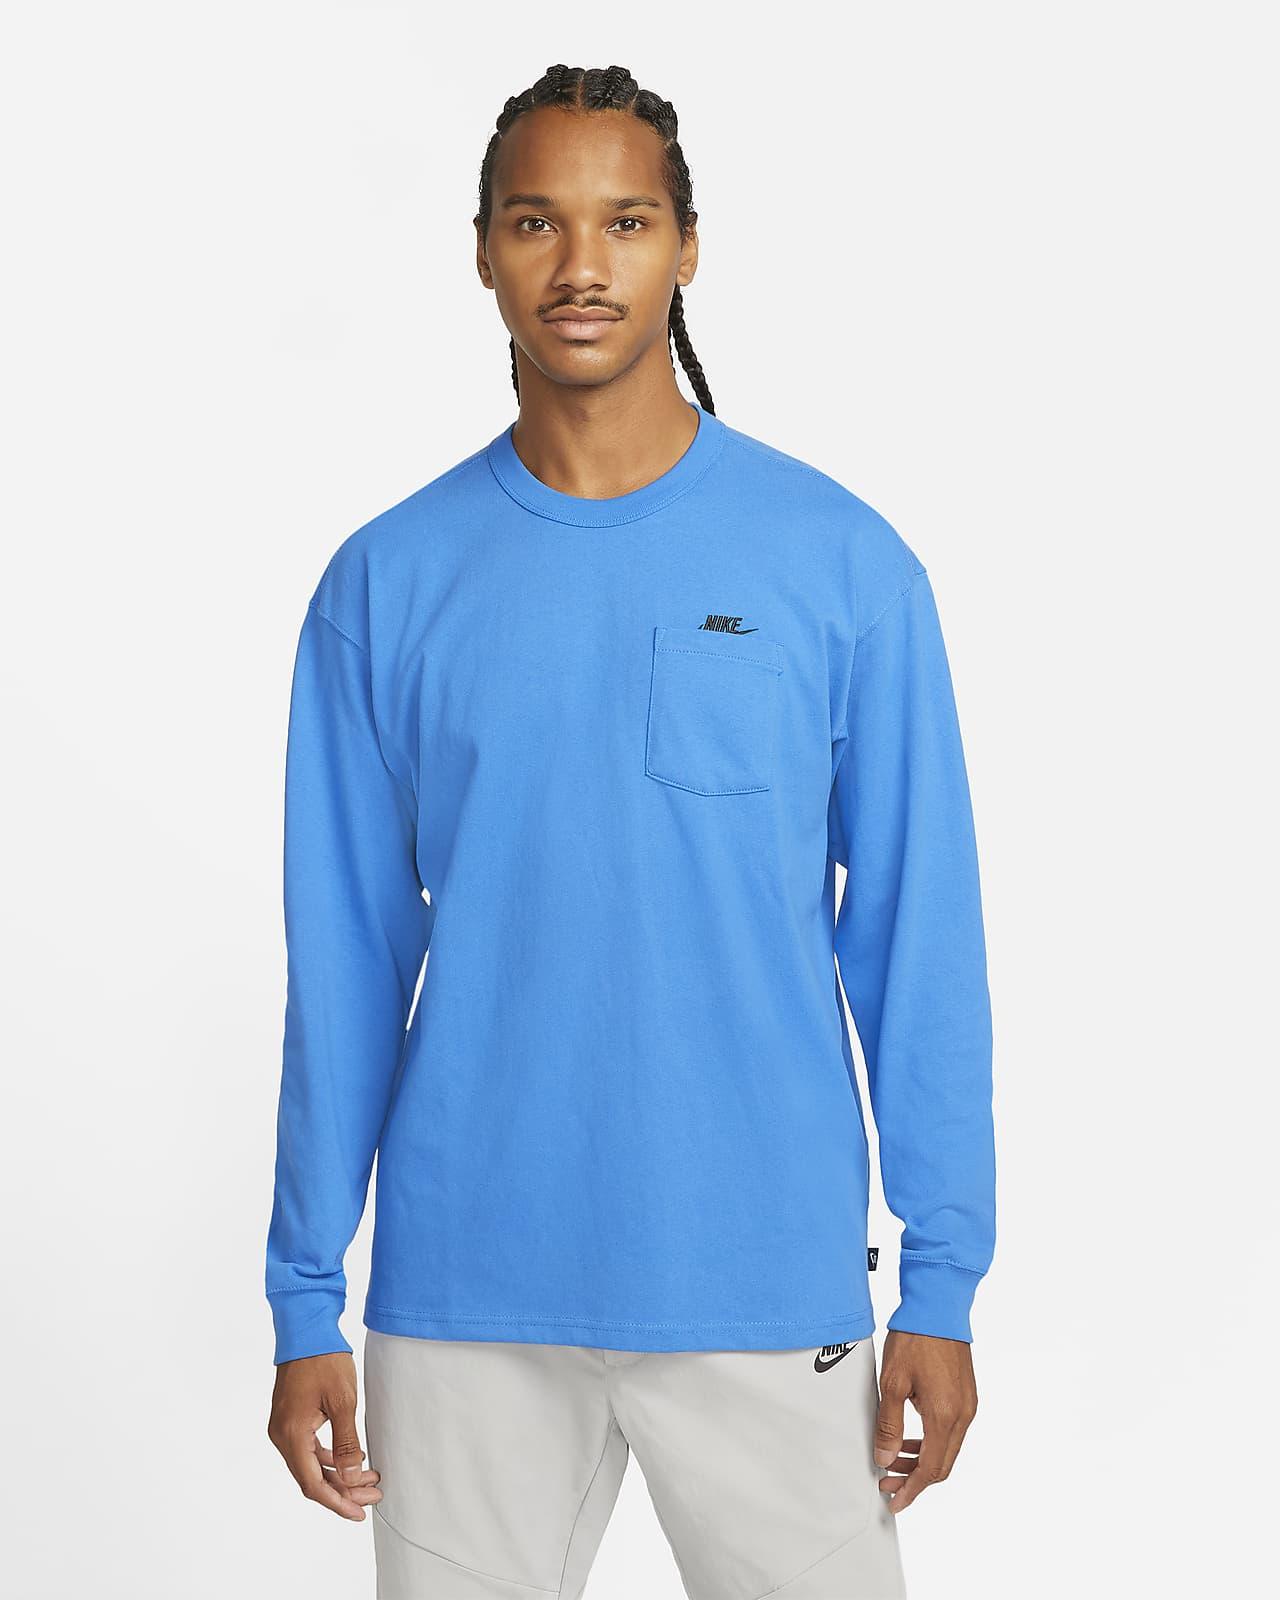 Nike Sportswear Premium Essentials Men's Long-Sleeve Pocket T-shirt